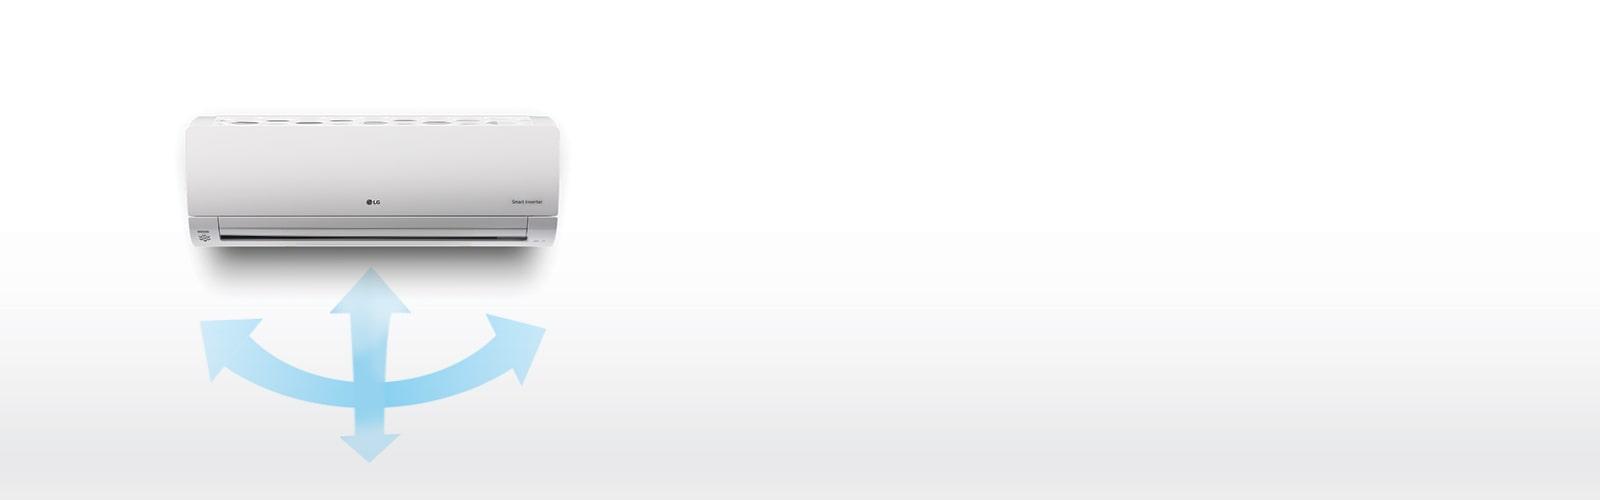 P09AWN 14   Premium 2.5kW Reverse Cycle Split System | LG Australia